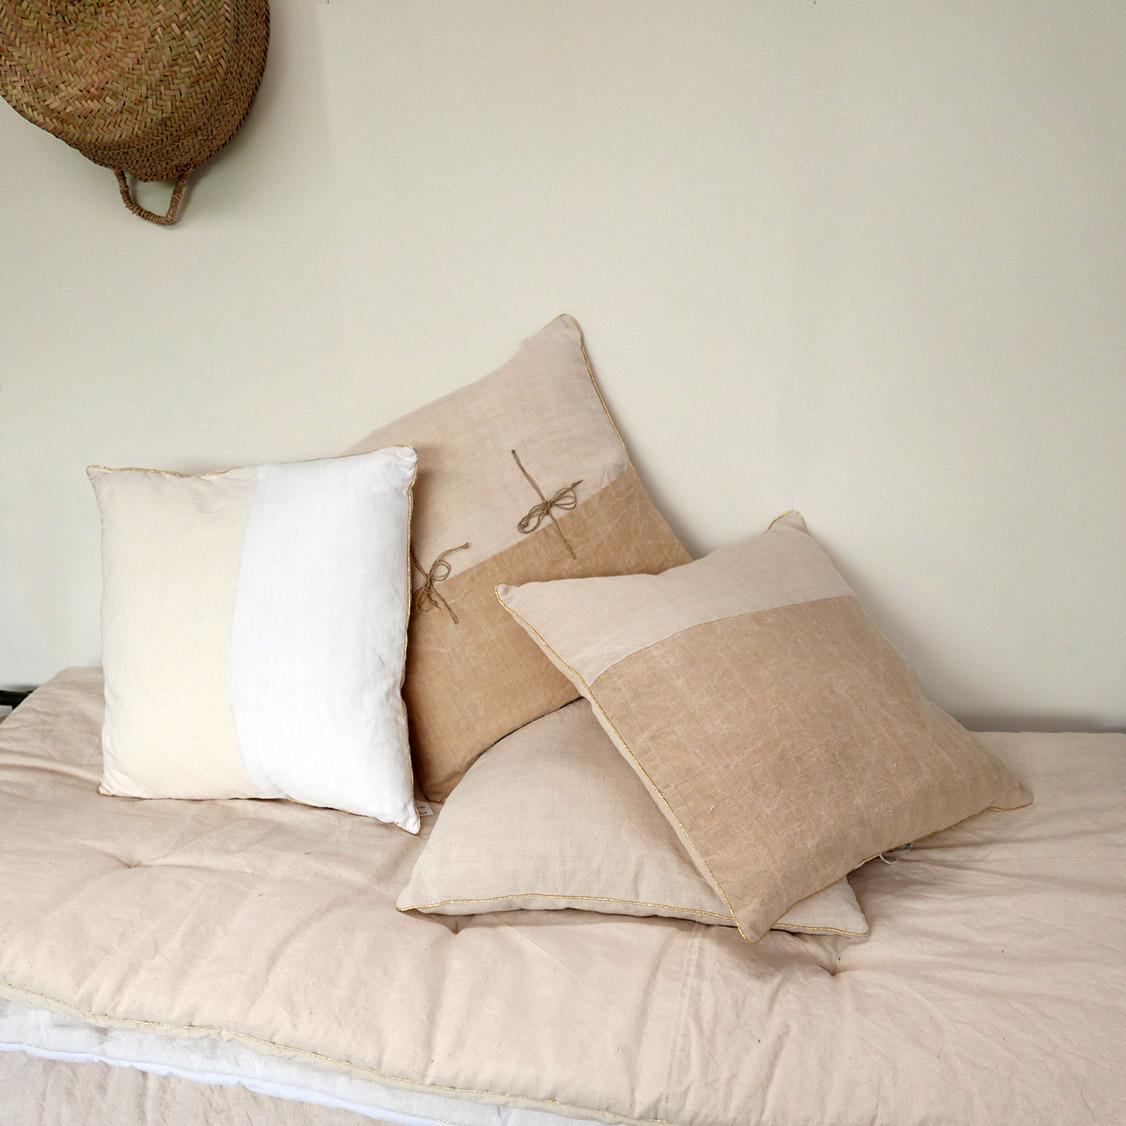 coussin en tissu ancien v 2 chez les voisins. Black Bedroom Furniture Sets. Home Design Ideas